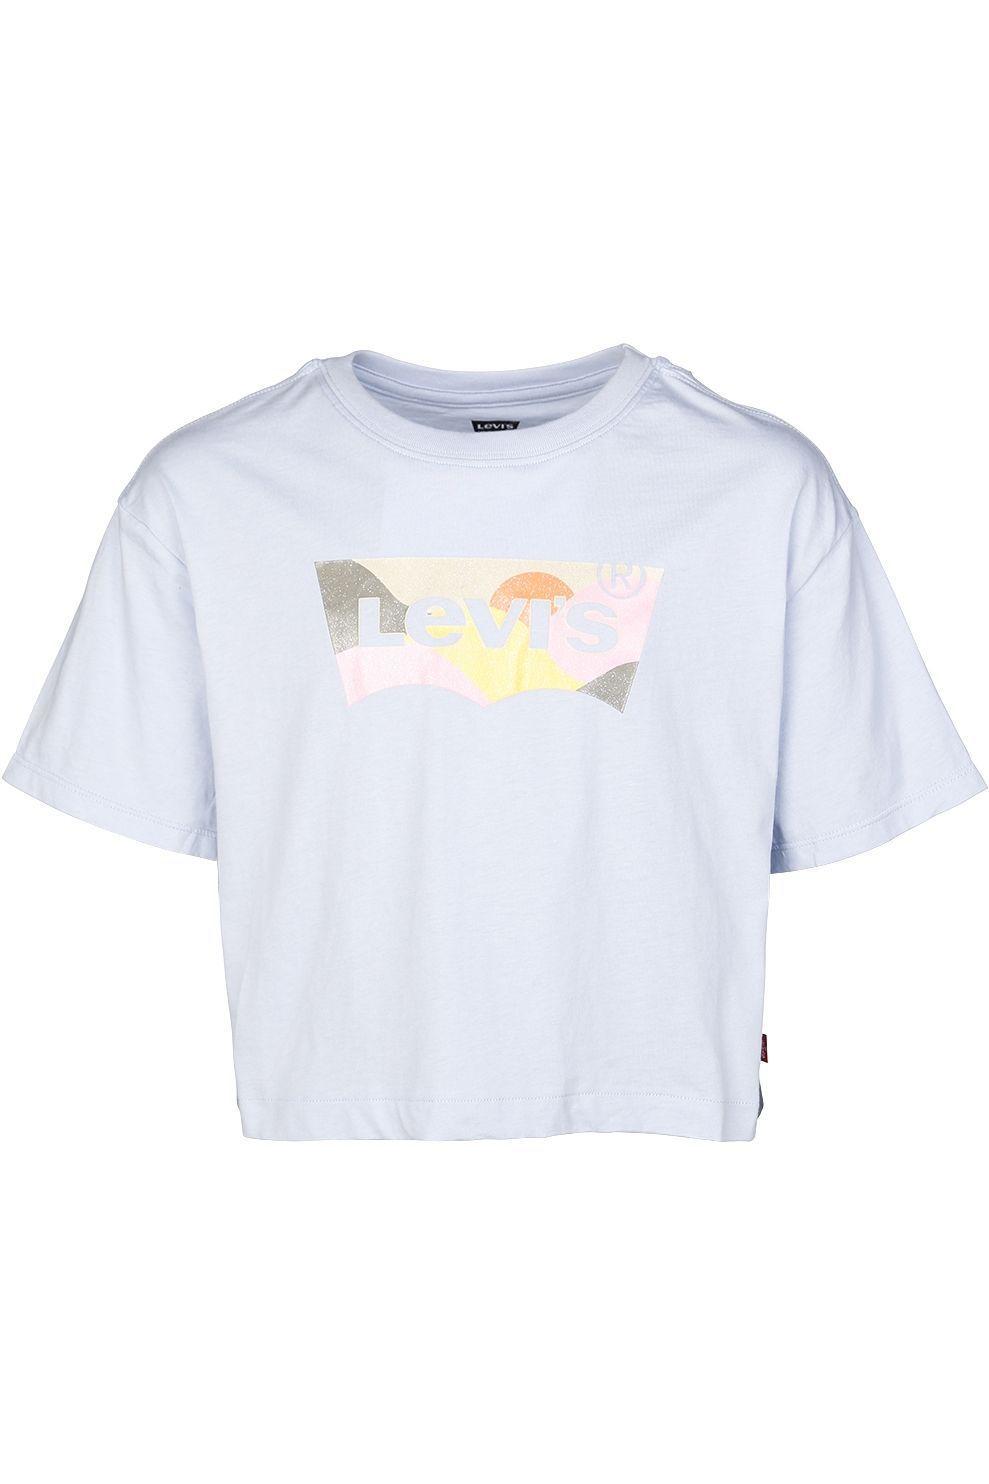 Levi's T-Shirt Lvg High Rise voor meisjes - Blauw - Maten: 10, 12, 14, 16